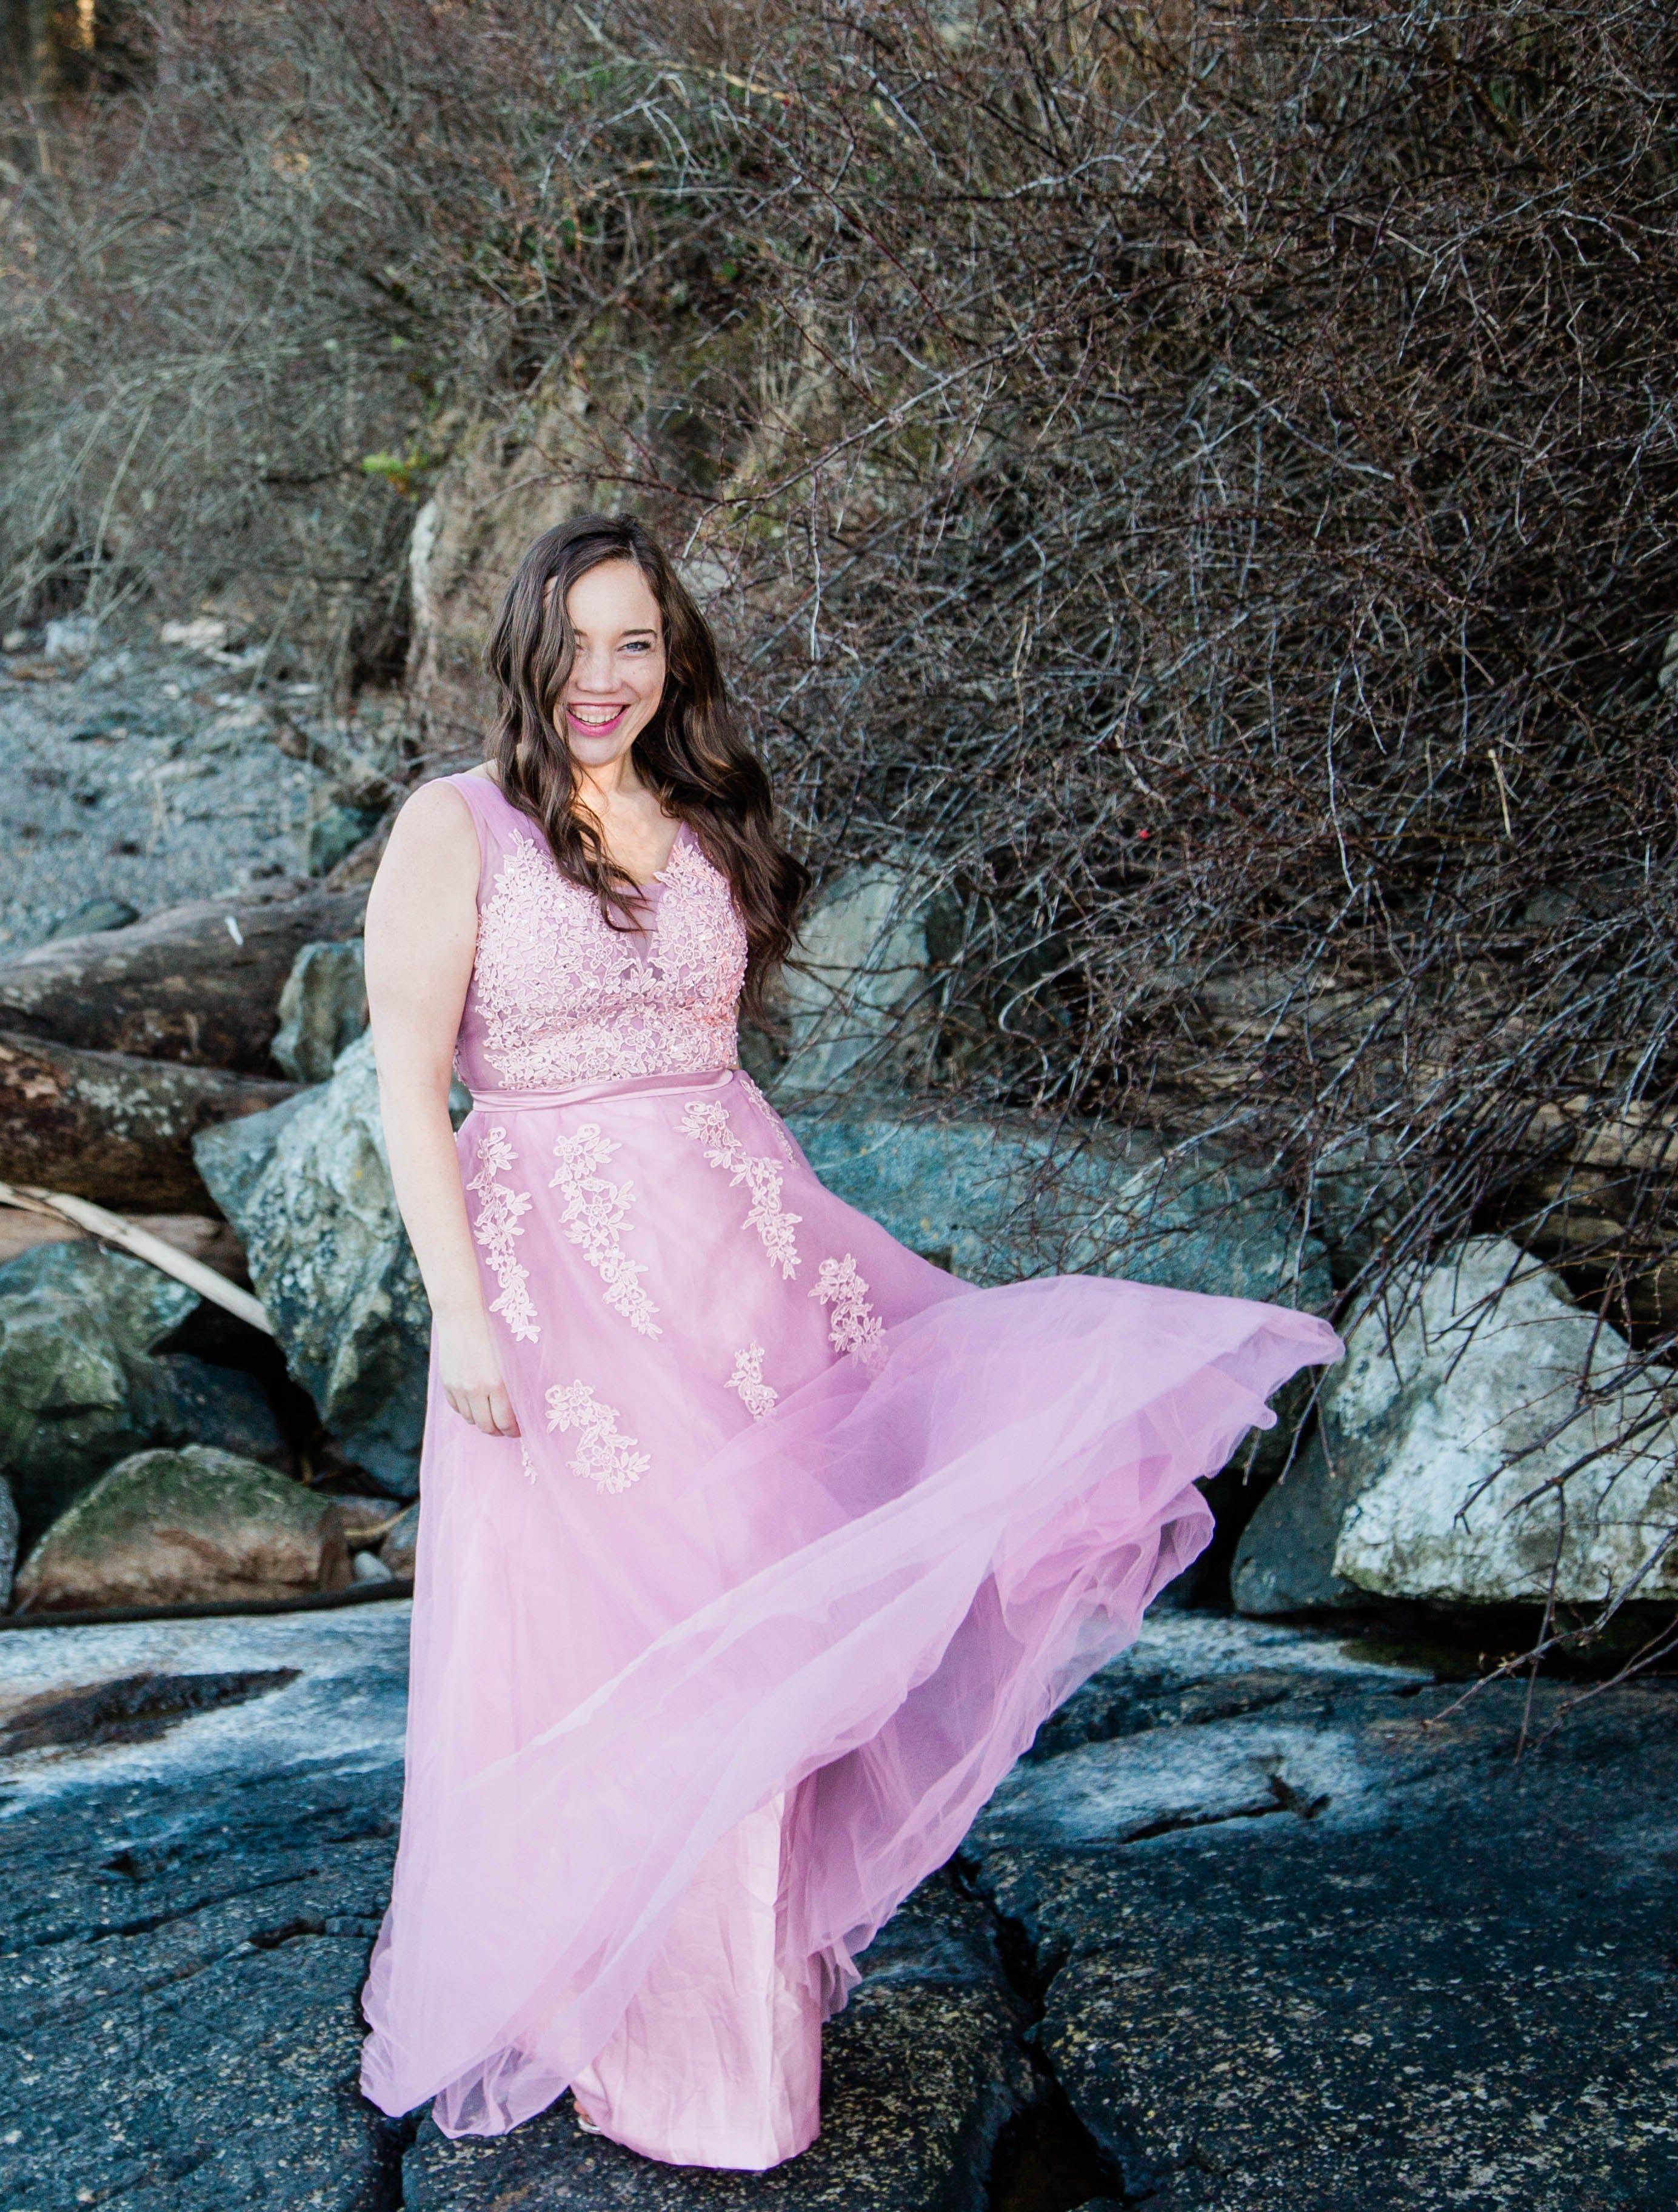 Best Formal Dresses On Amazon Amazon Wardrobe Best Formal Dresses Formal Dresses Dresses